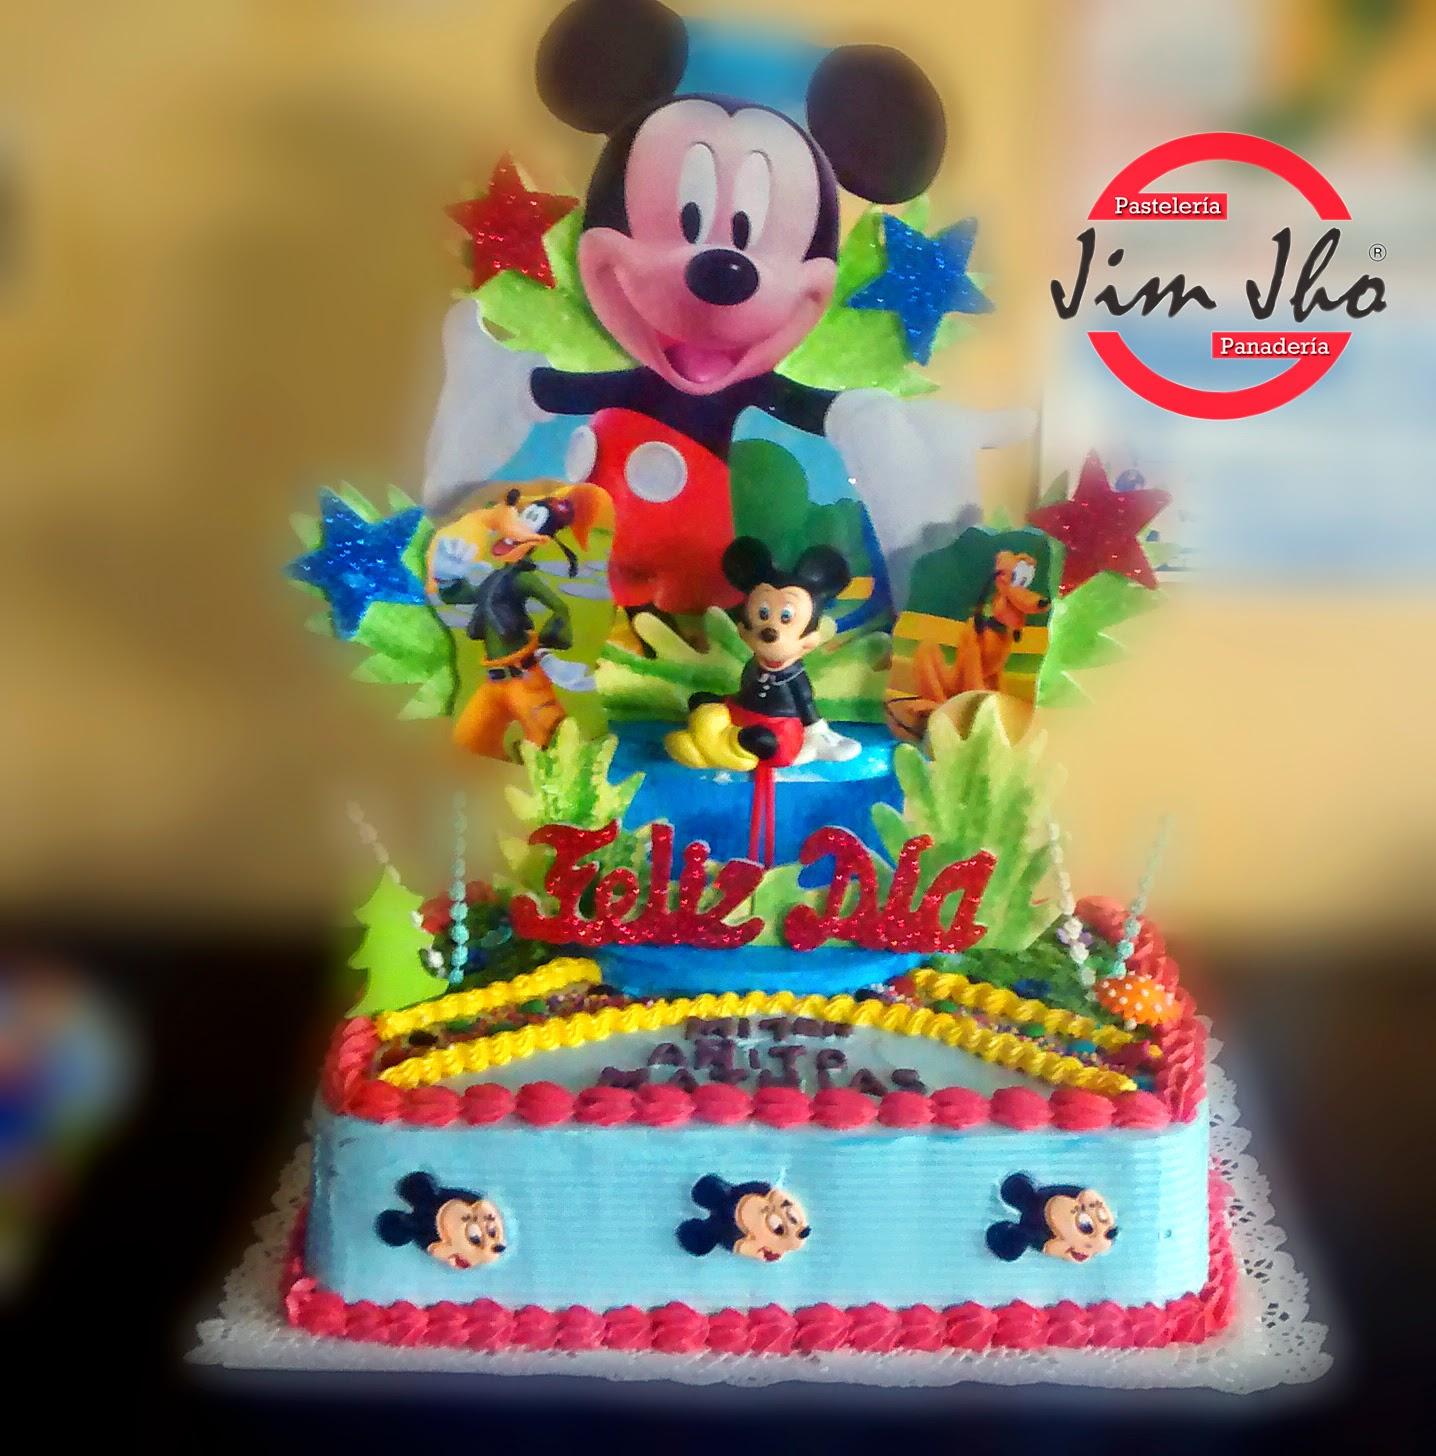 Torta Mickey Mouse Pasteler 237 A Jimjho